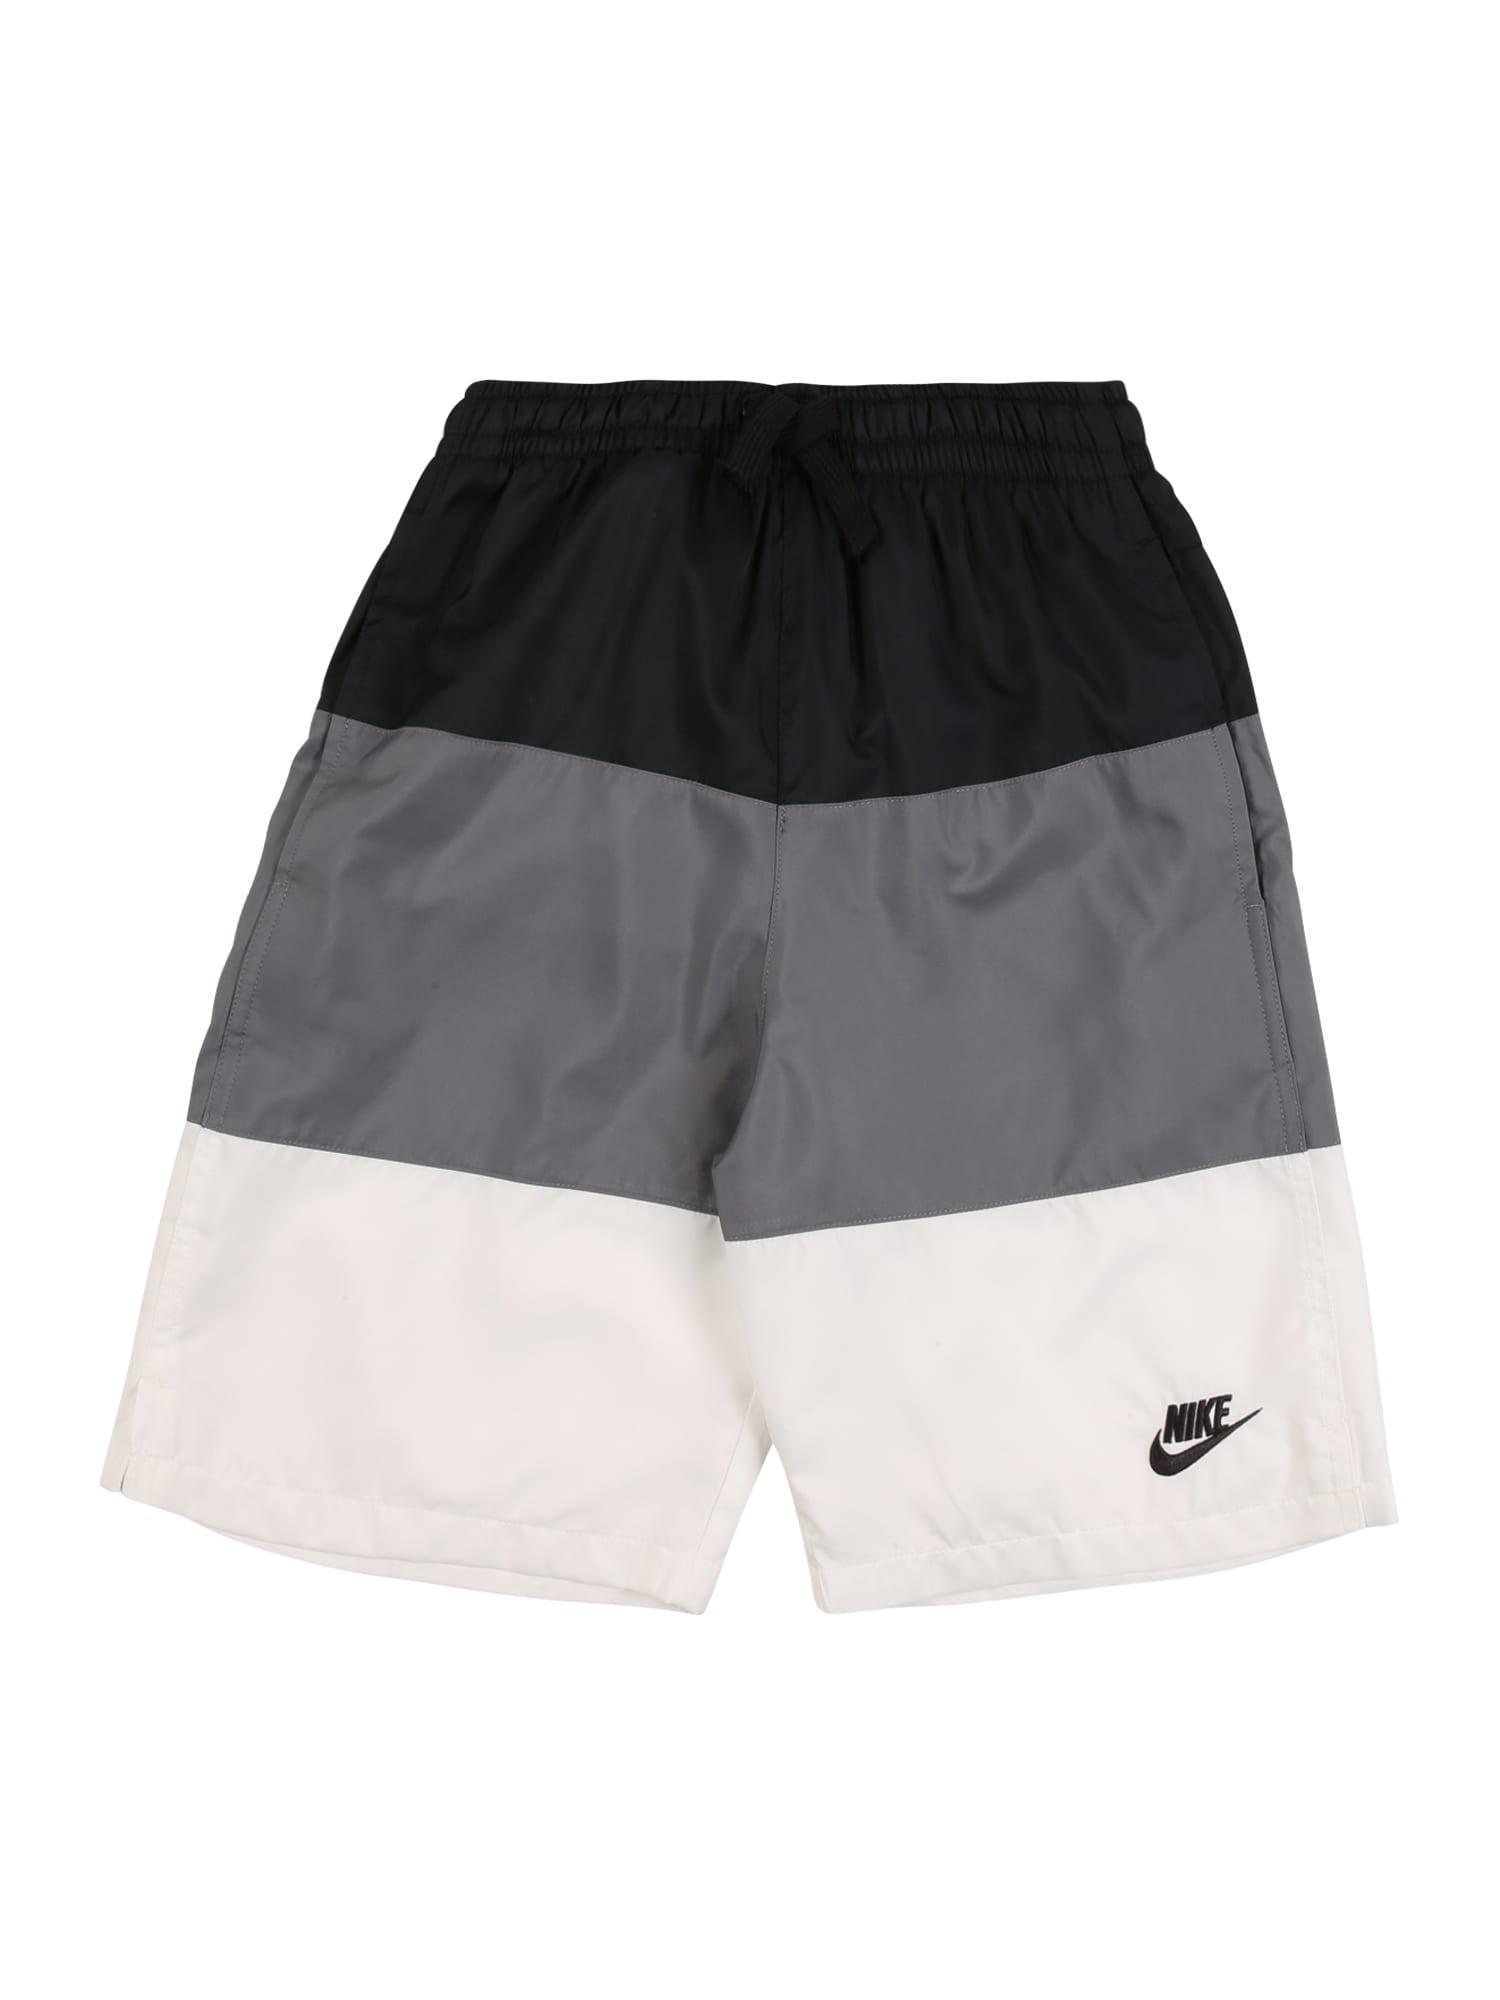 Nike Sportswear Nohavice  čierna / sivá / biela